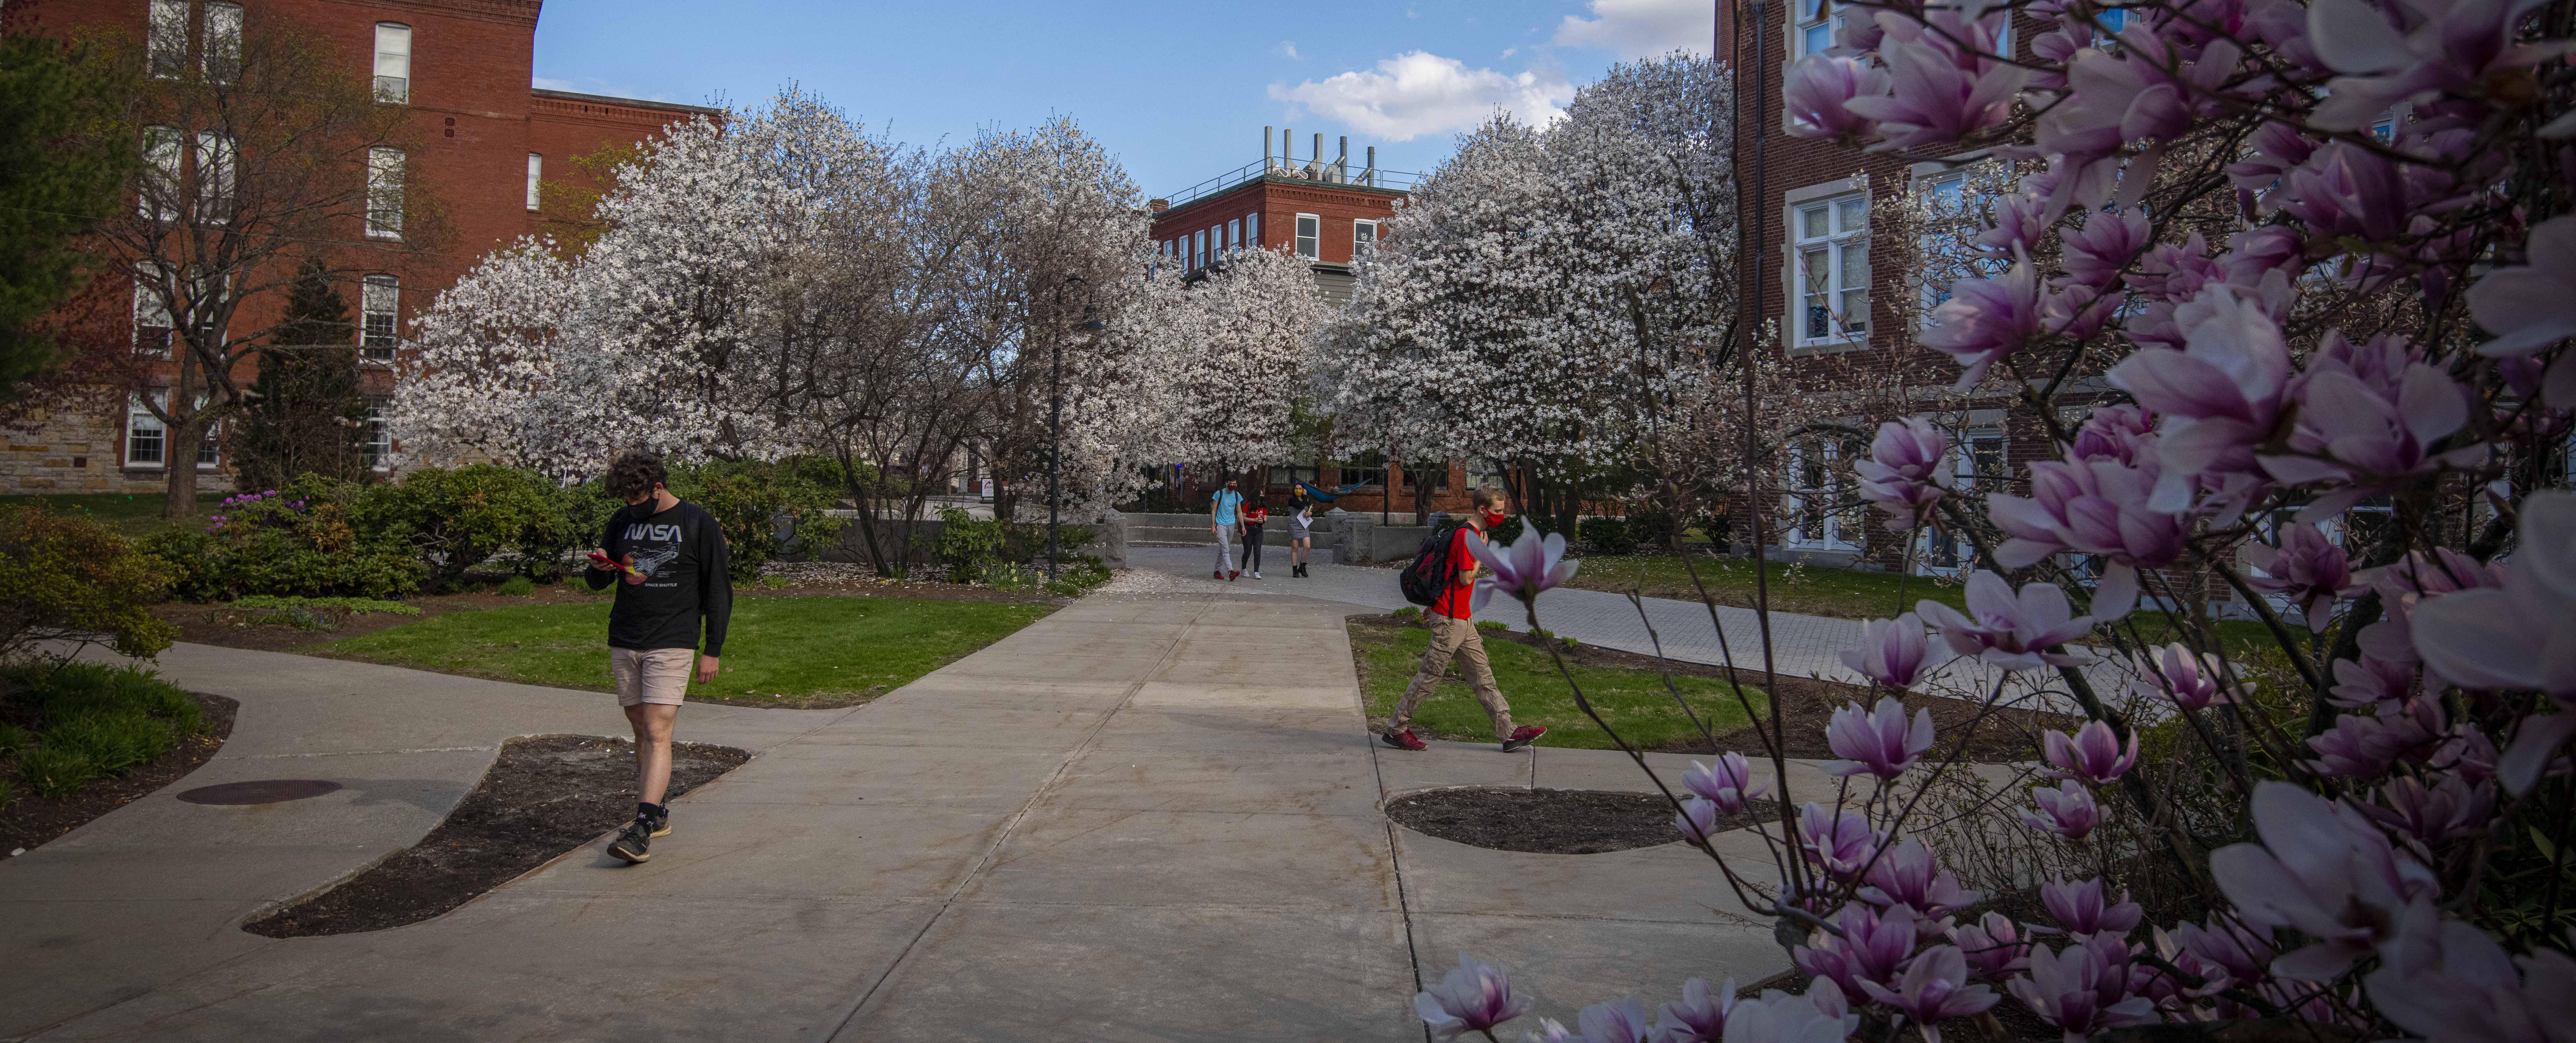 WPI students walking around campus